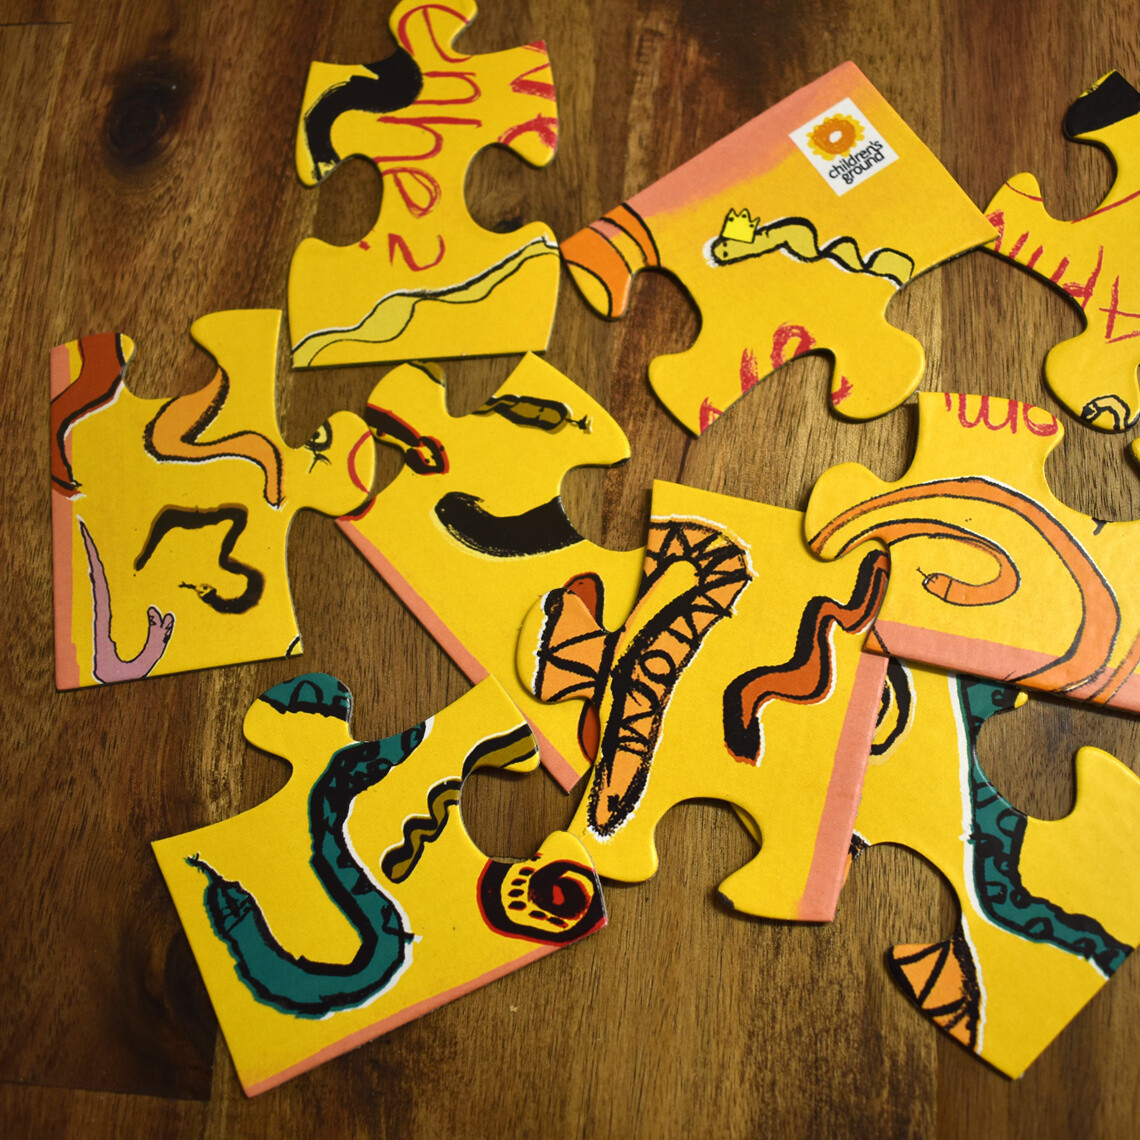 Apmwe Iwenhe? (What Snake?) Jigsaw Puzzle